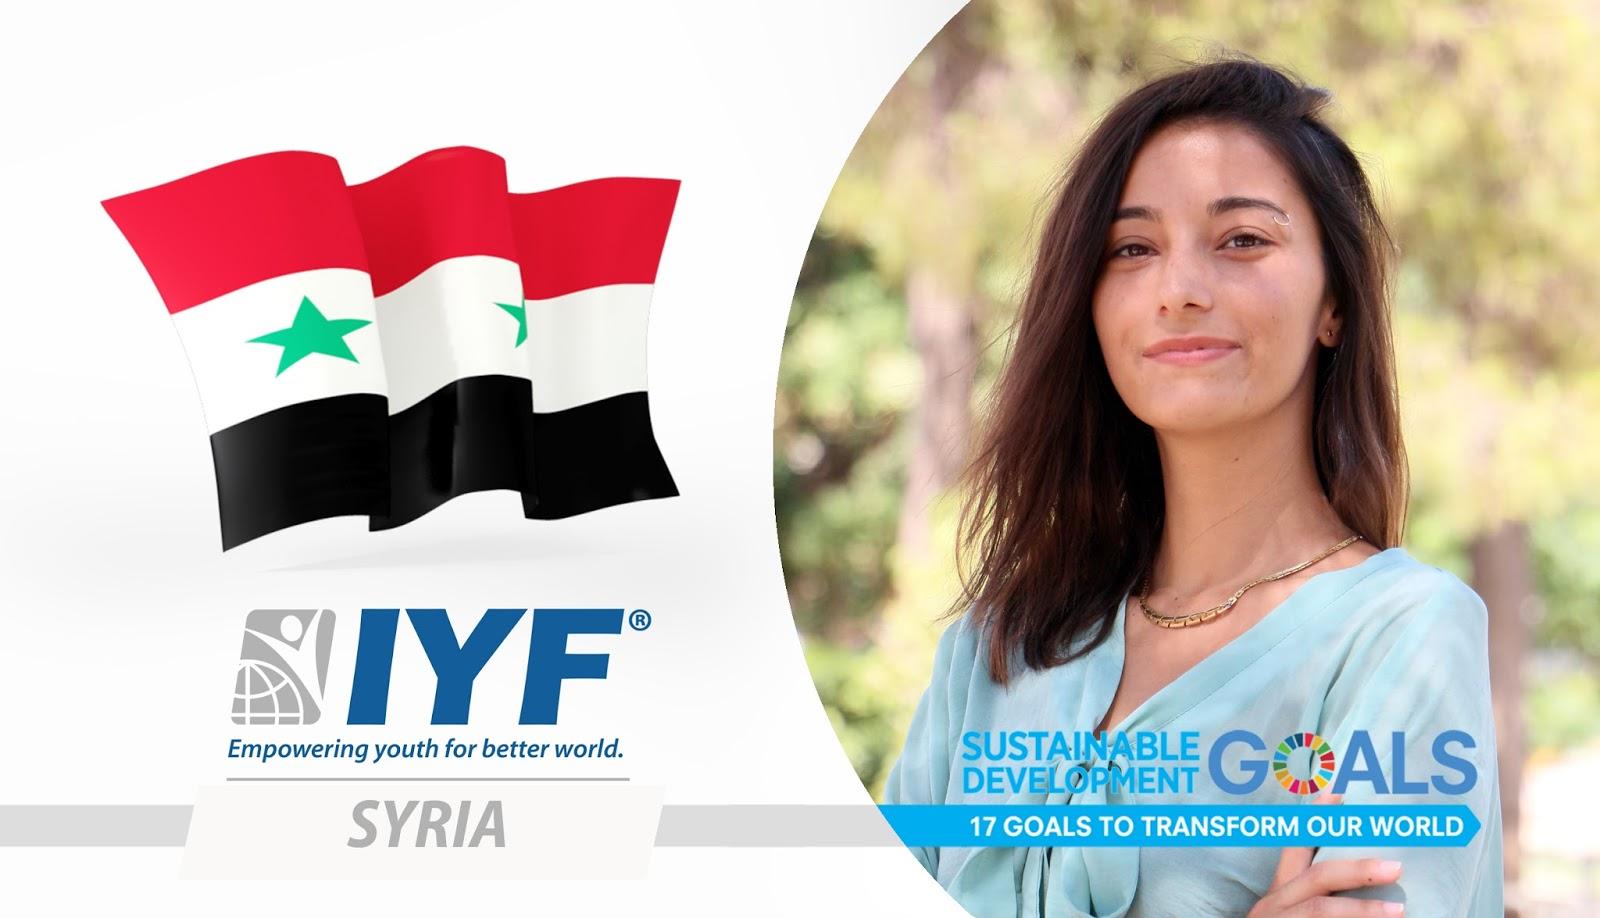 Sarah Zein, IYF Representative in Syria